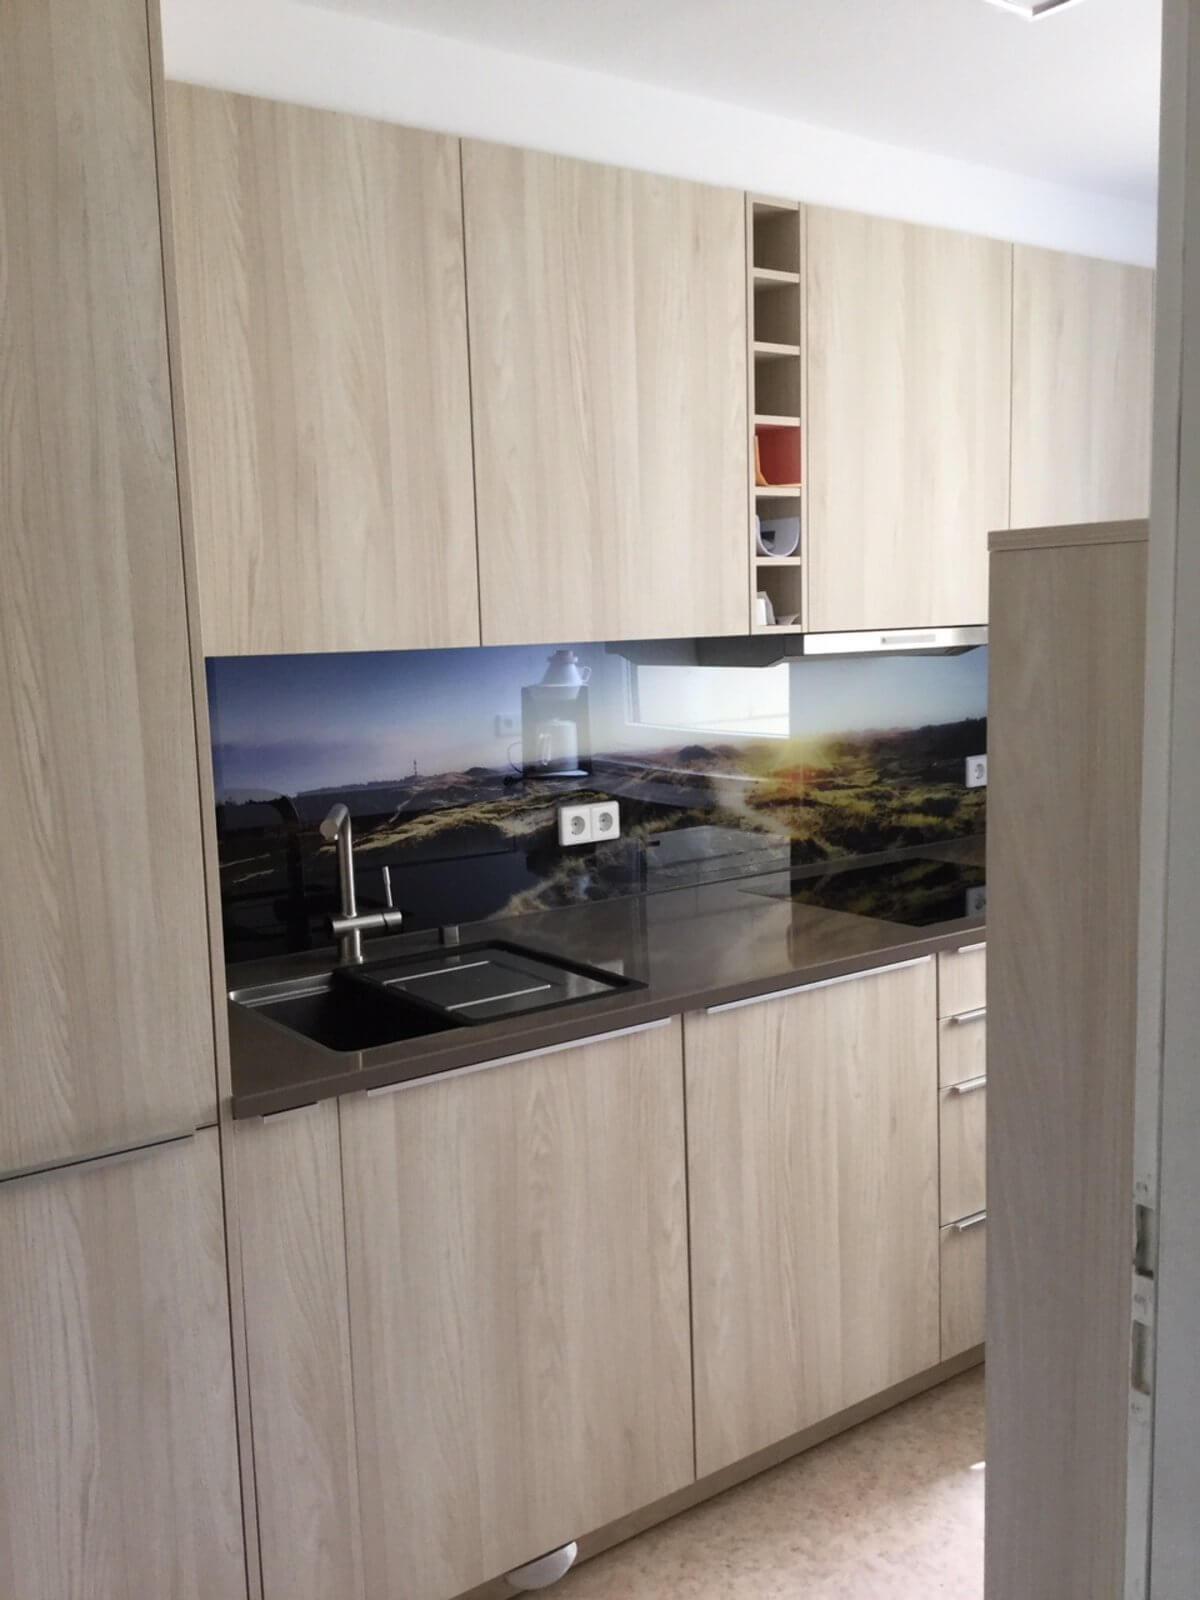 innovative k che gmbh ludwigshafen. Black Bedroom Furniture Sets. Home Design Ideas